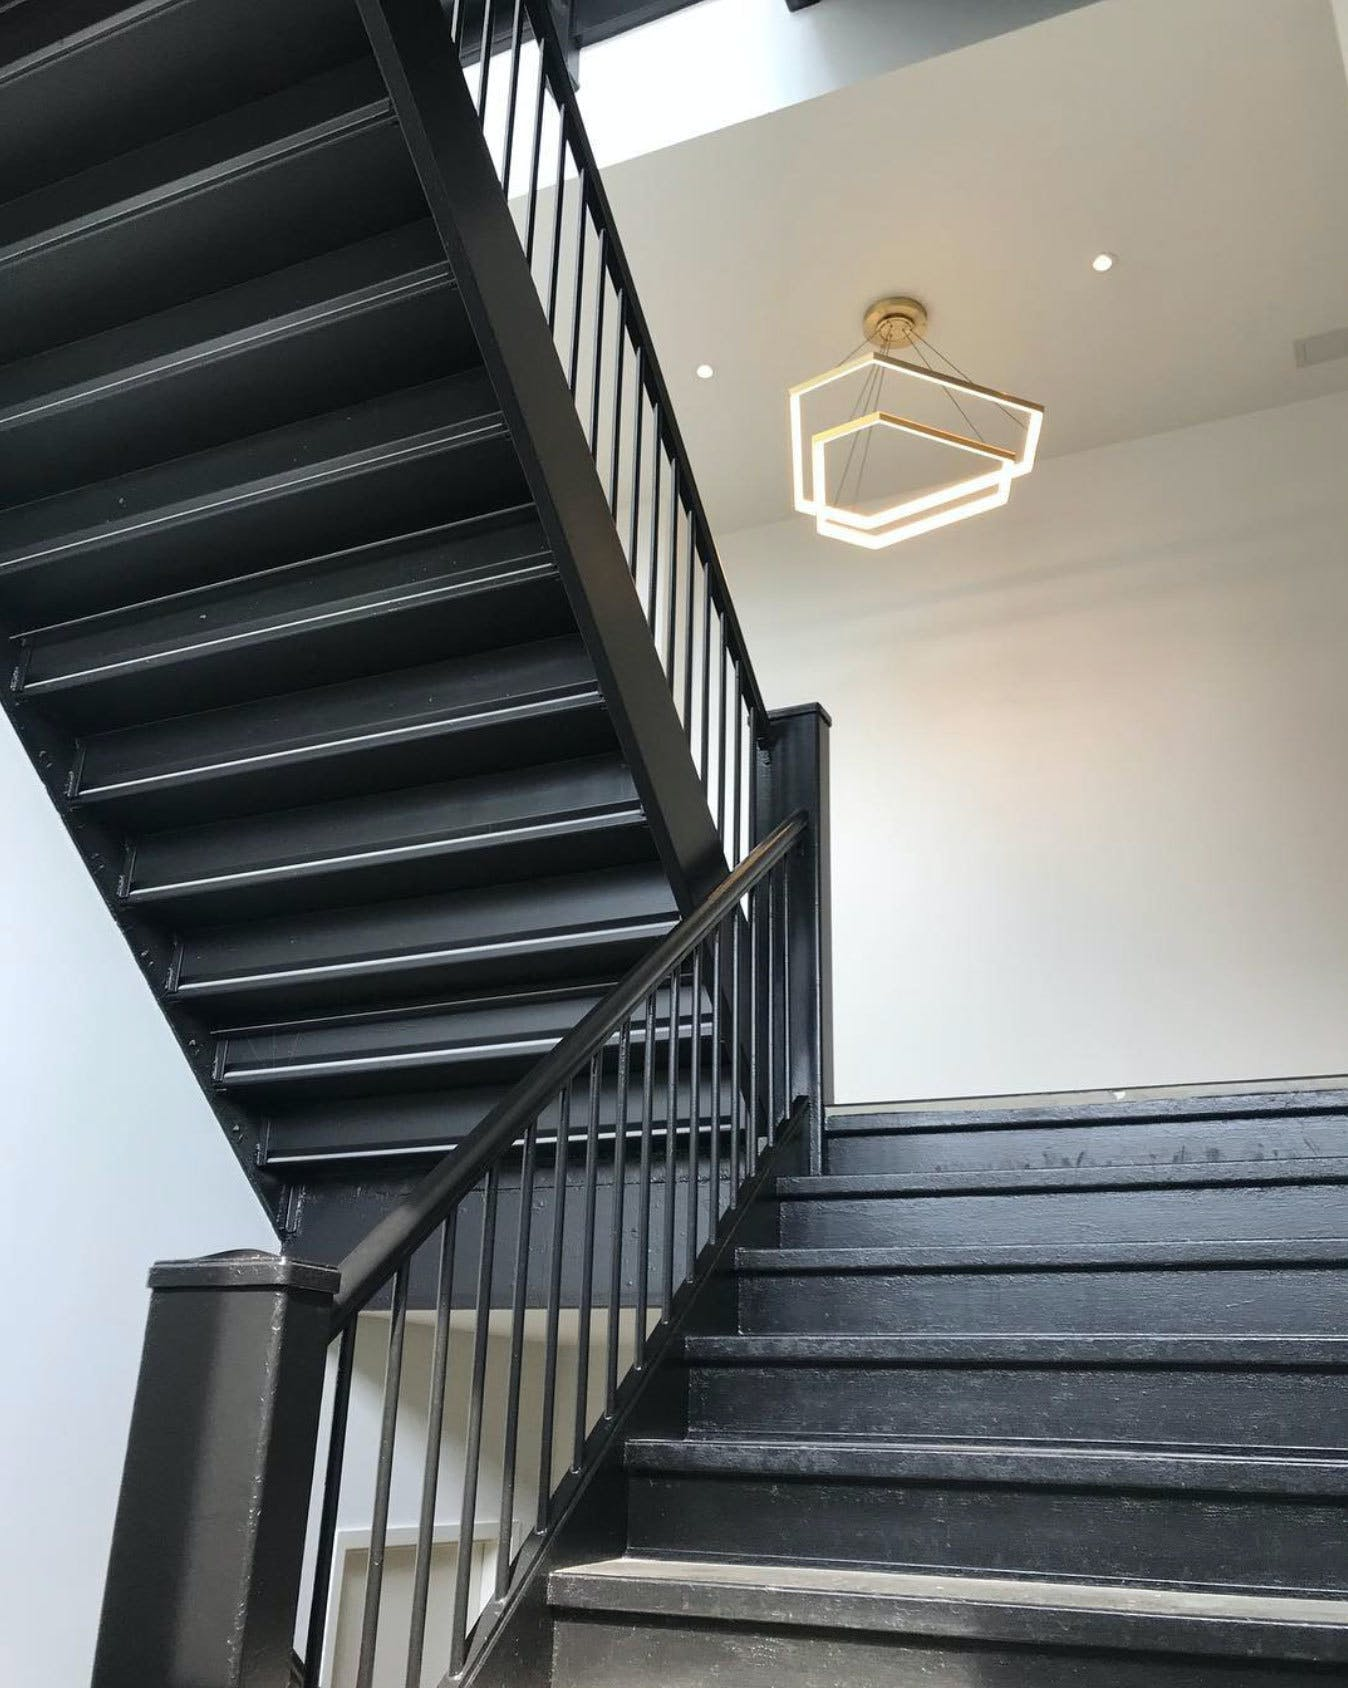 Studio-endo-ditri-cascade-dxc43-hanging-light-stairwell-insitu-haute-living